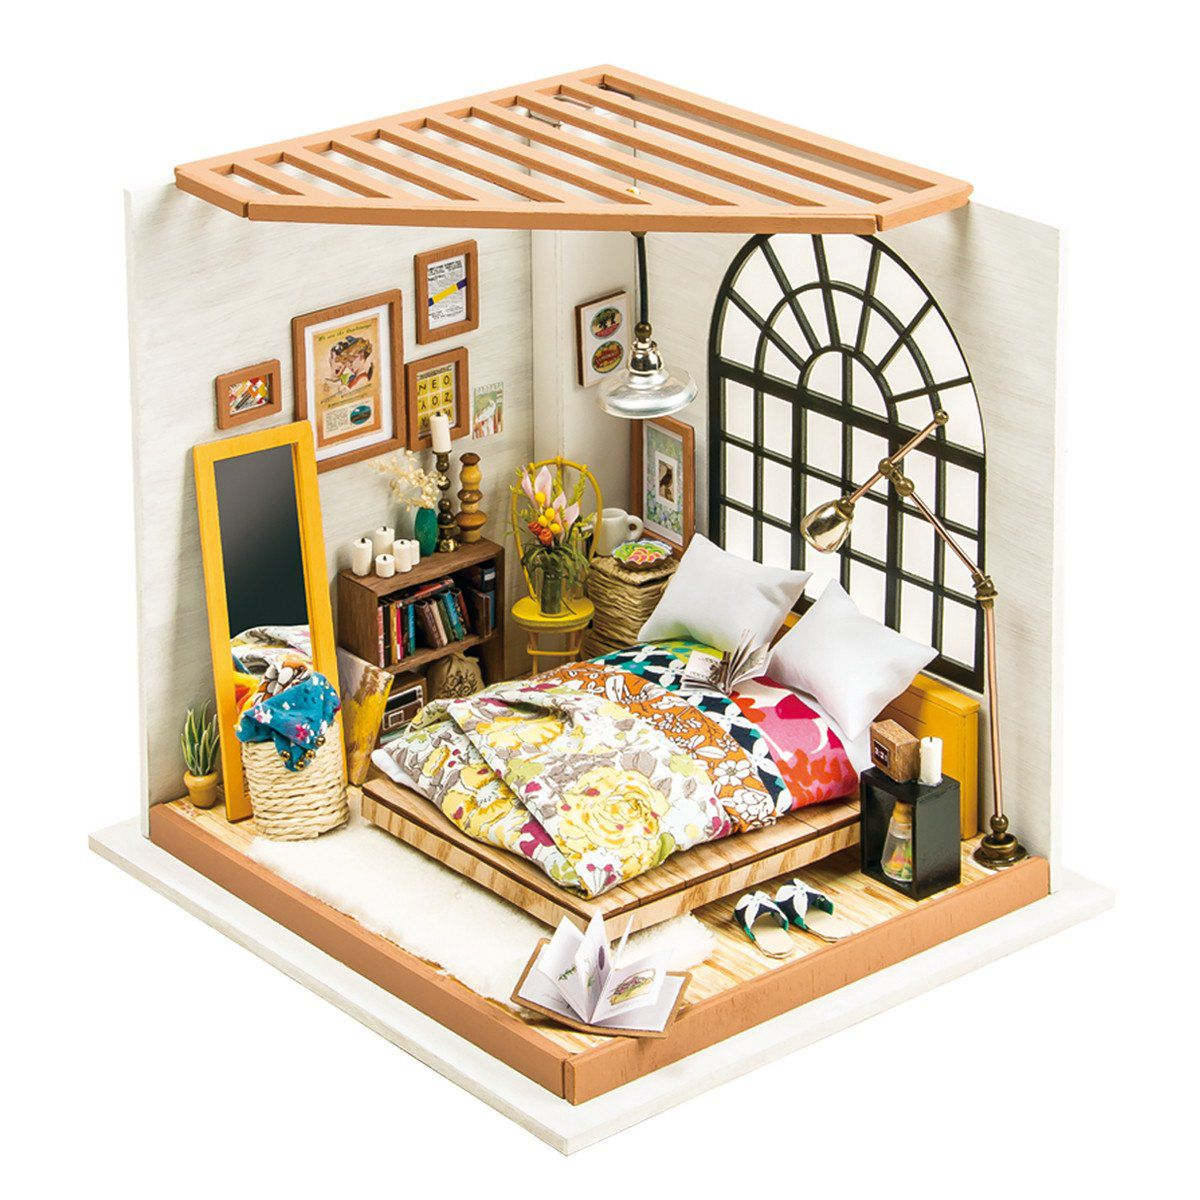 Alice Dreamy bedroom